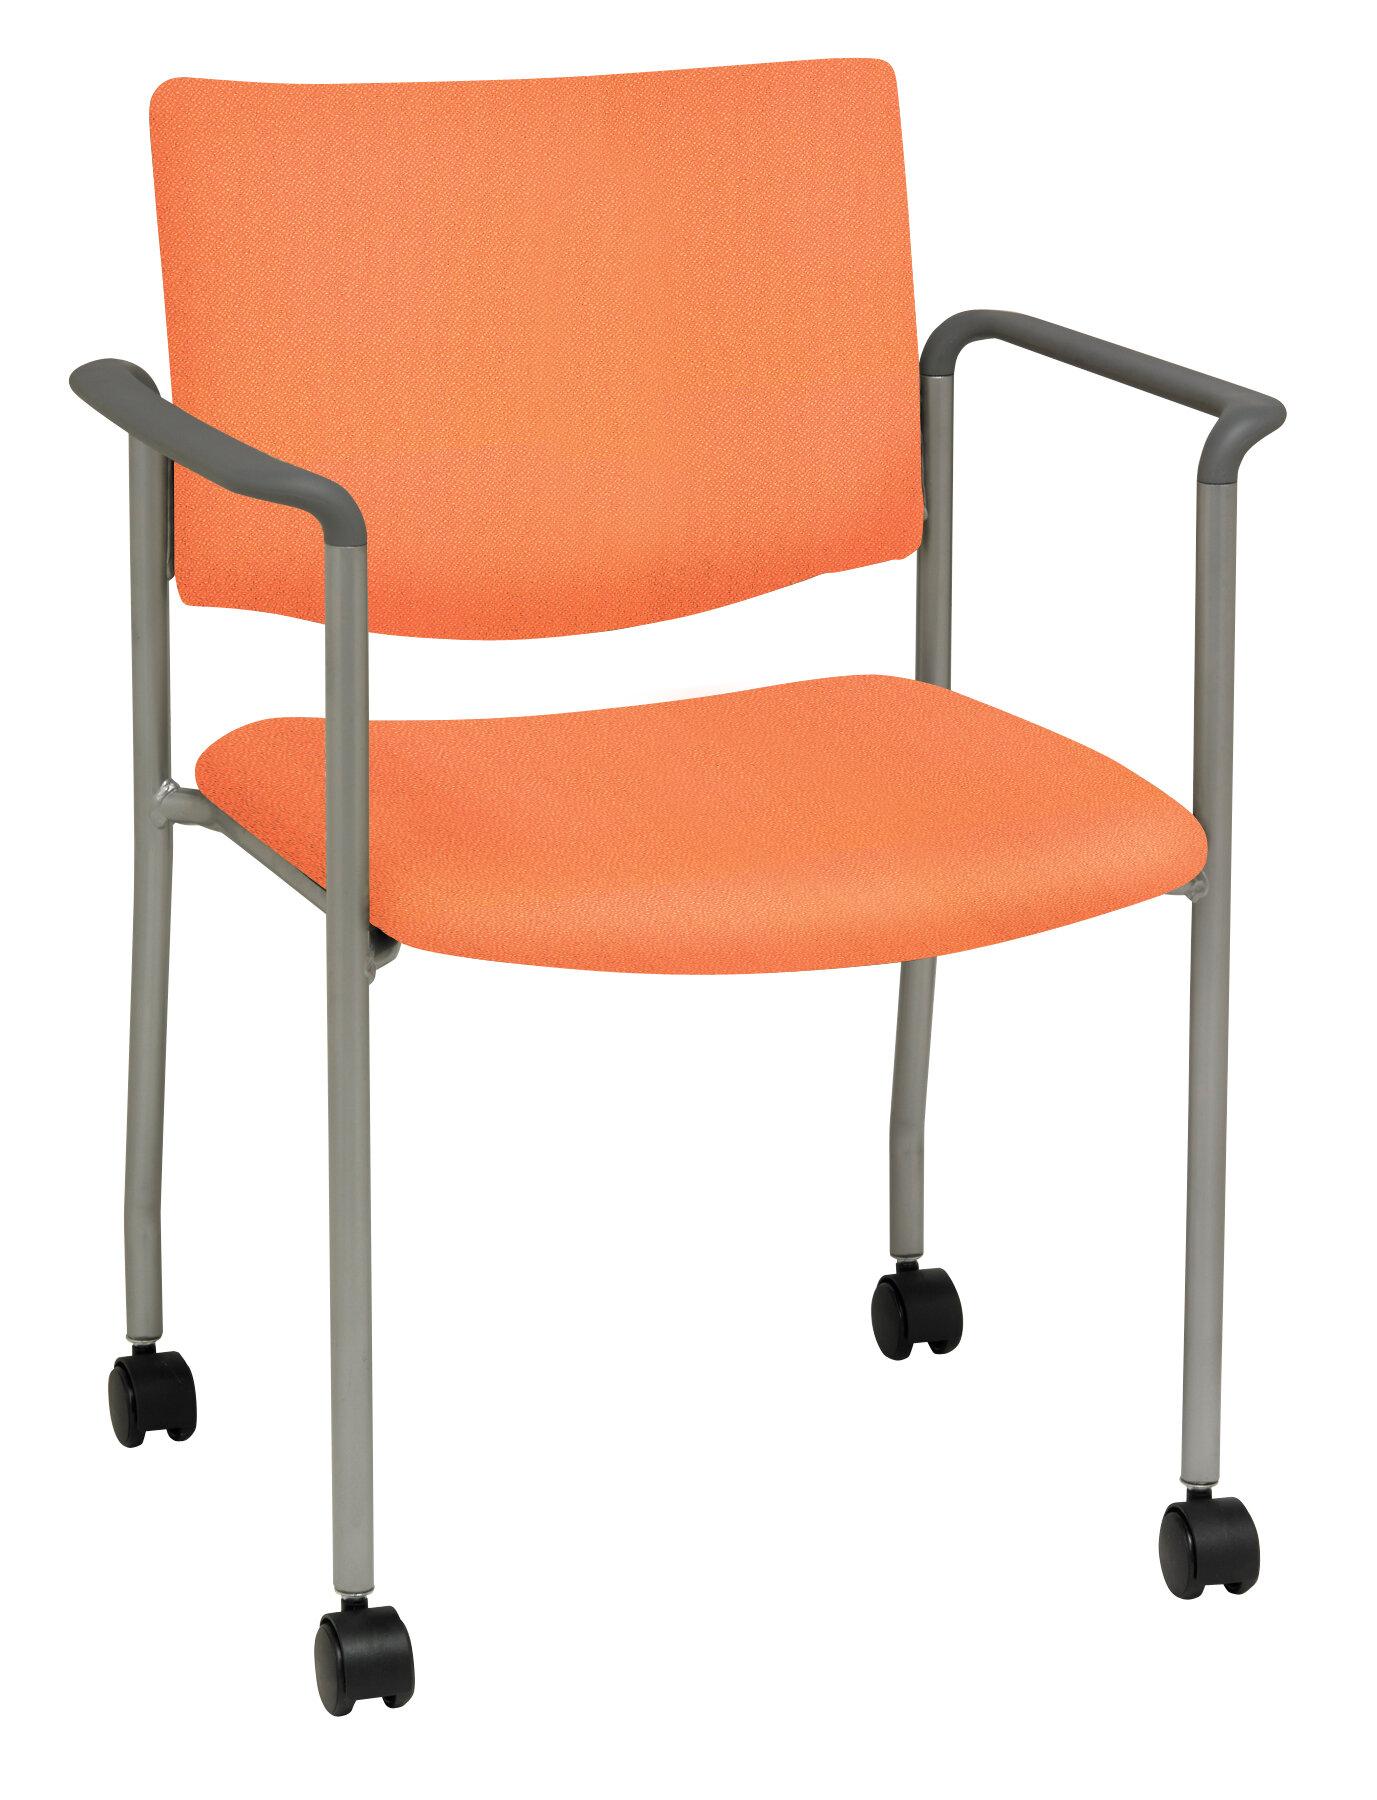 KFI Seating Evolve Series Stacking Chair